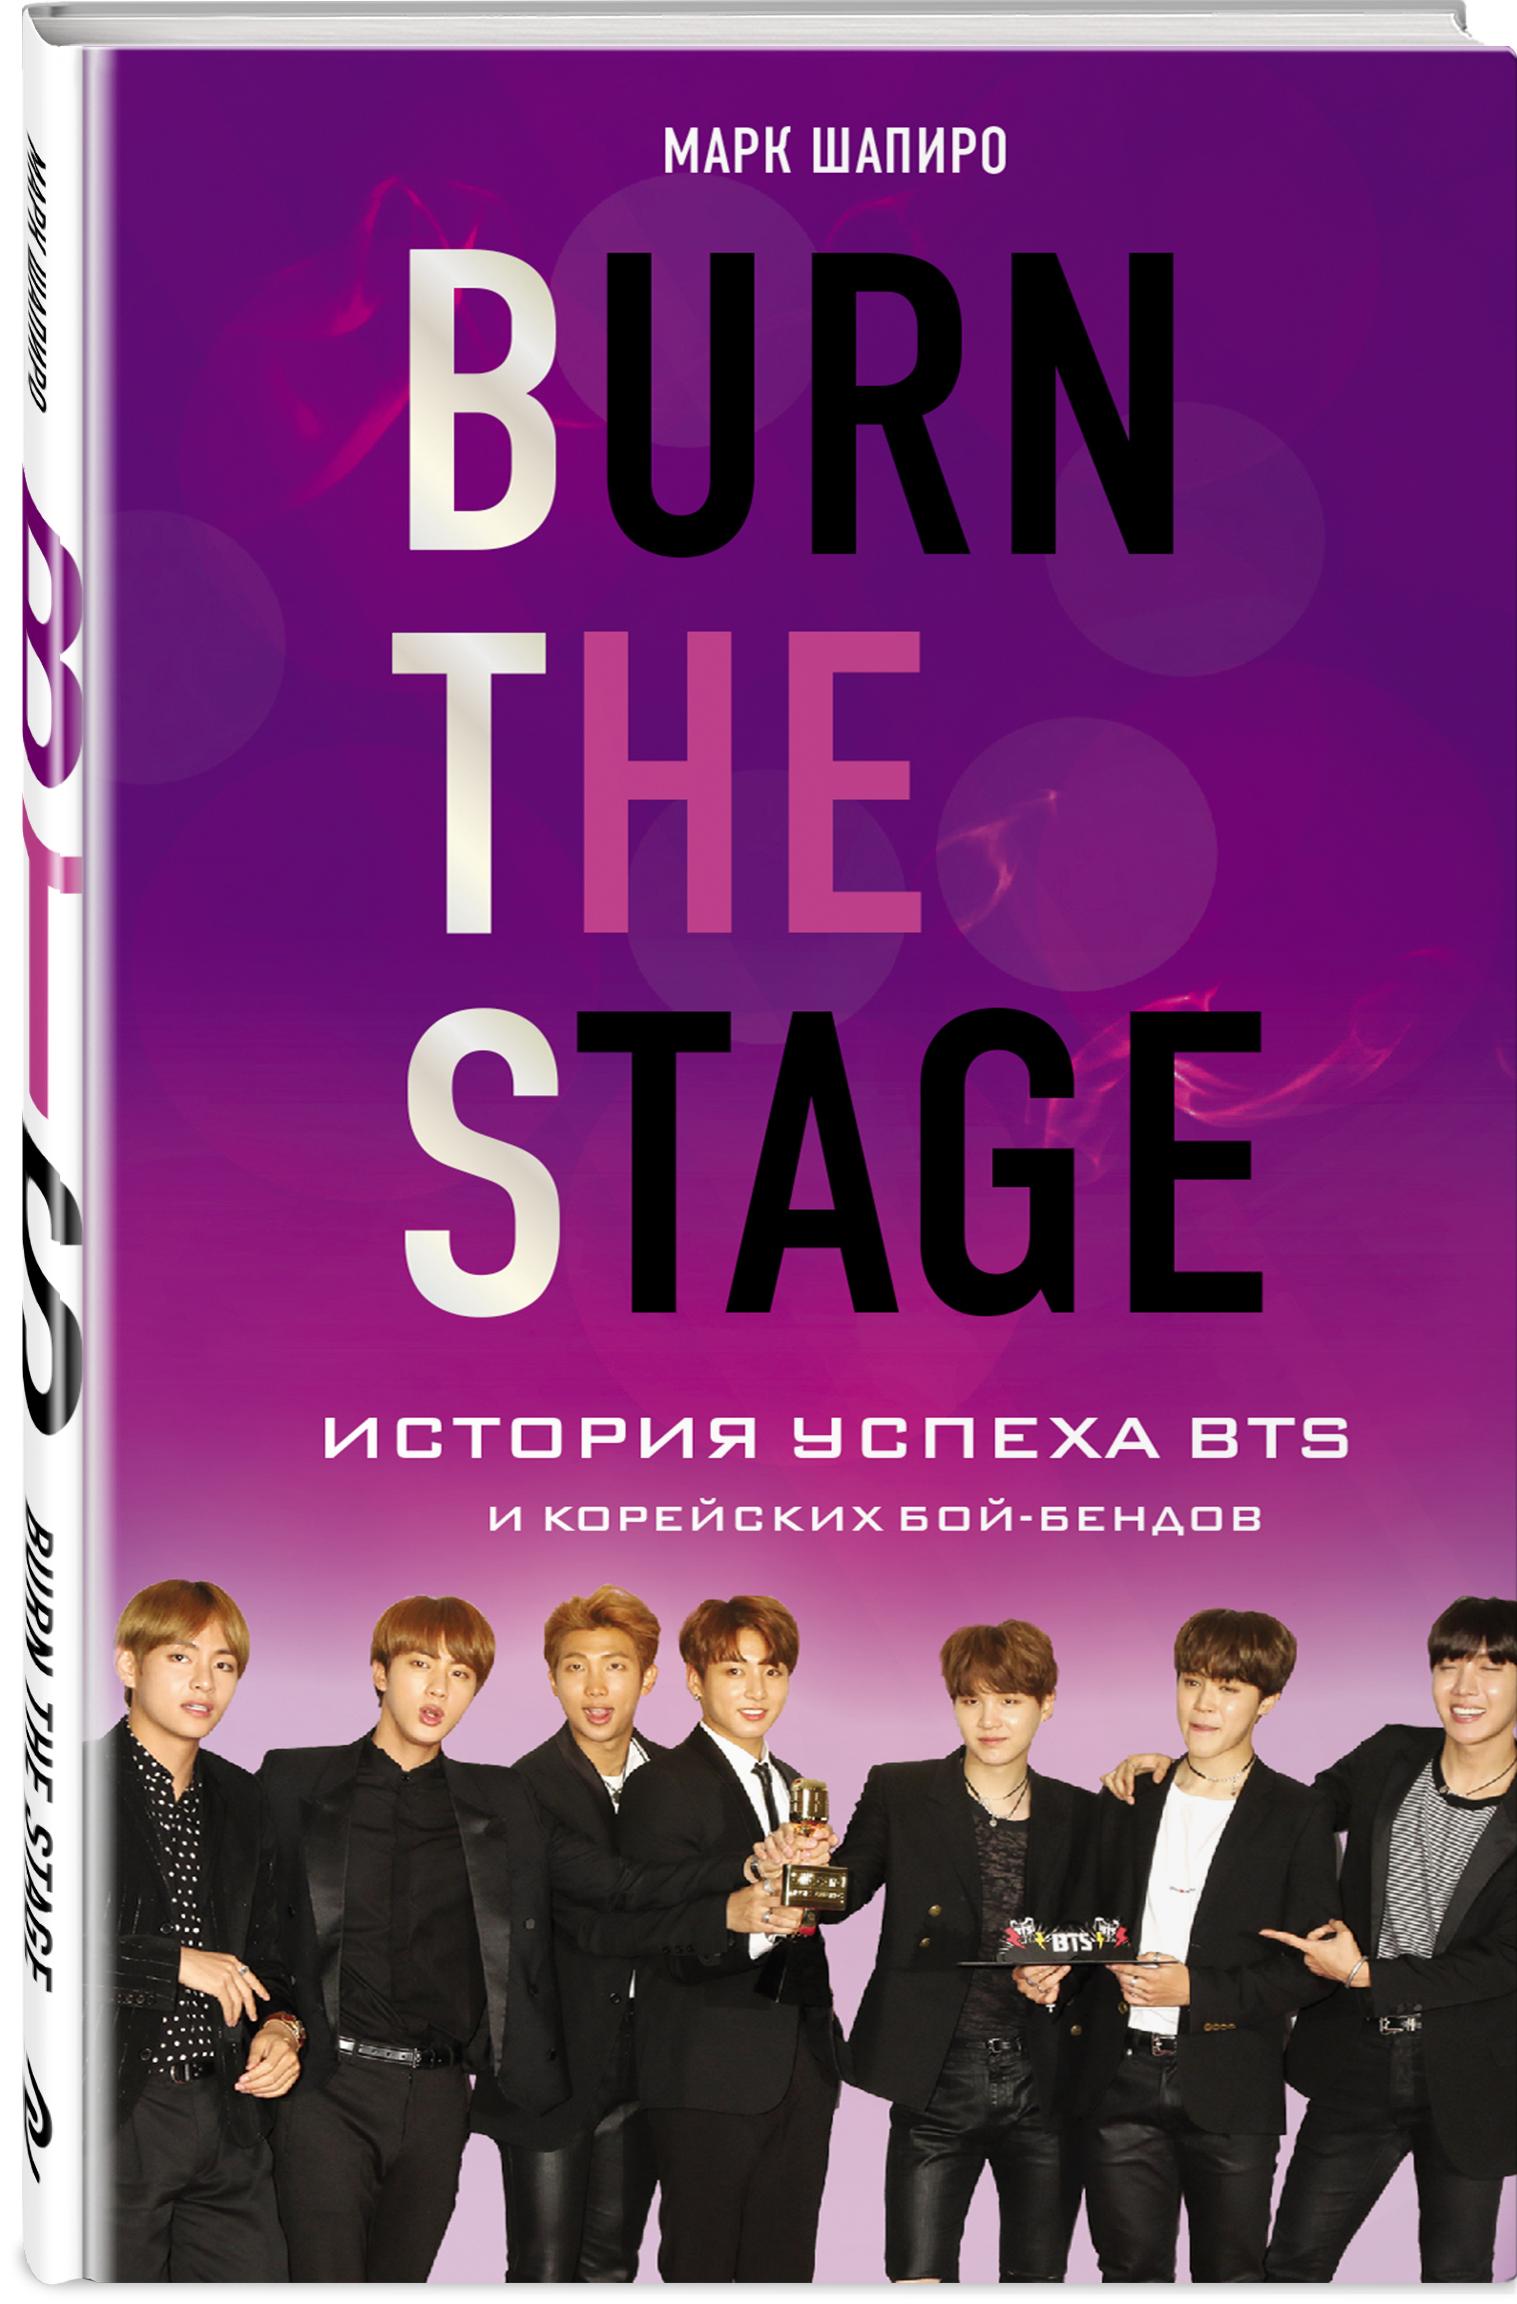 Burn The Stage: История успеха BTS и корейских бой-бендов фото